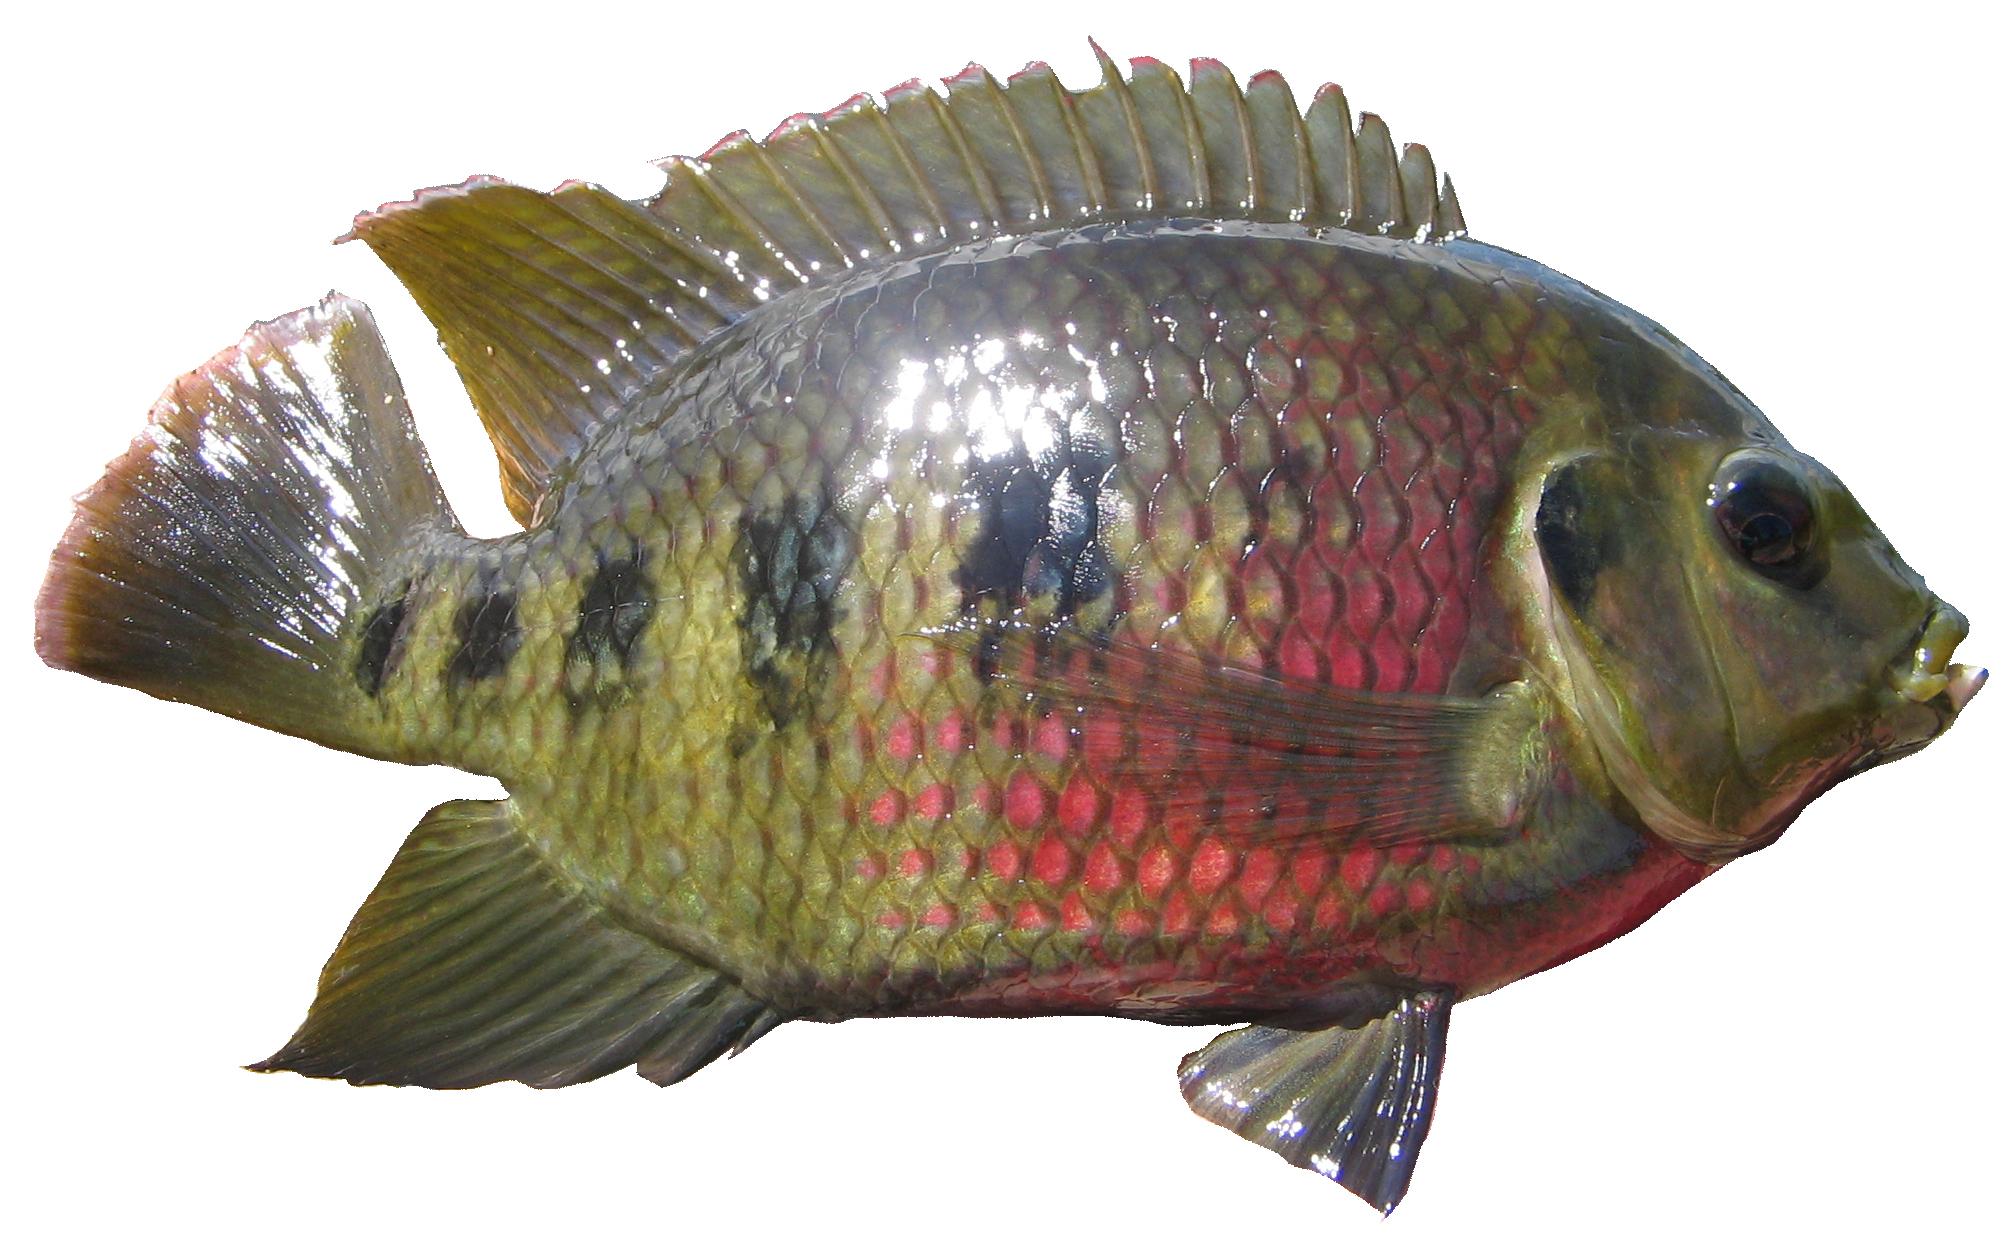 2009x1239 Spotted Tilapia.jpg